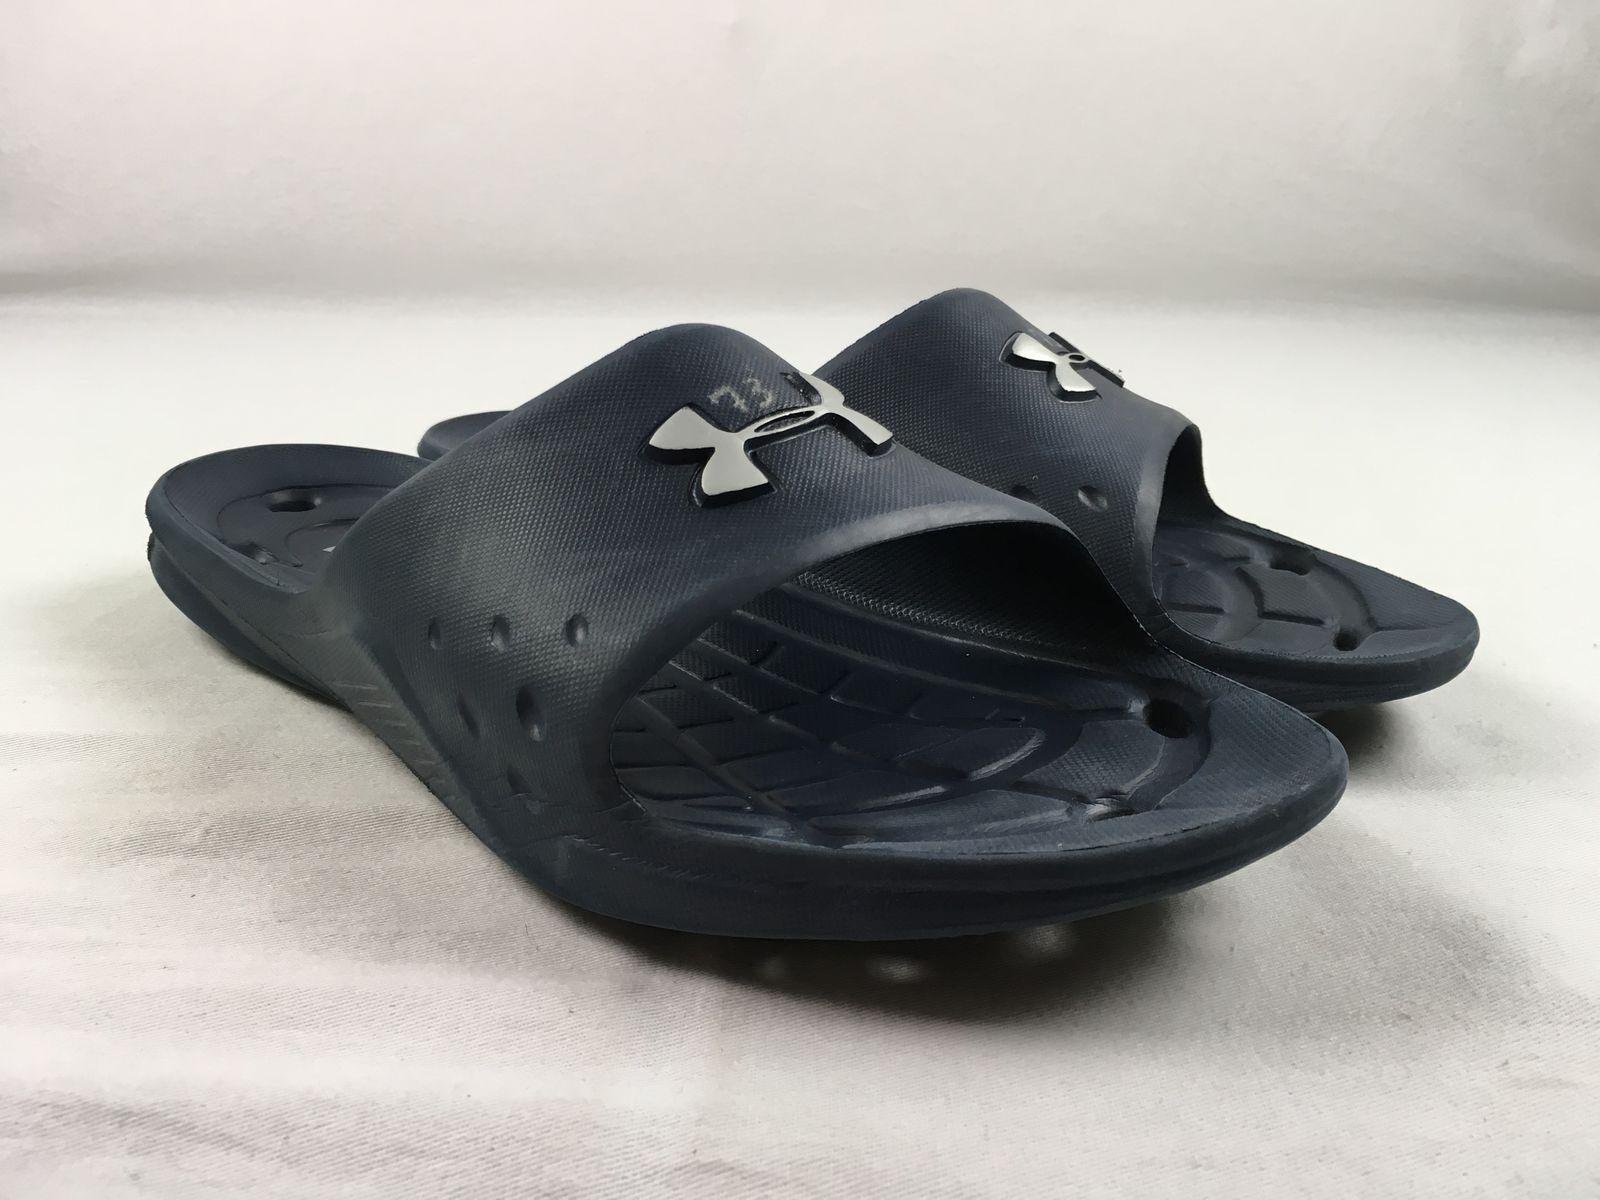 979be6caf05e0 Under Armour - Blue Sandals       Flip Flops (Men s 15) - Used 329c41